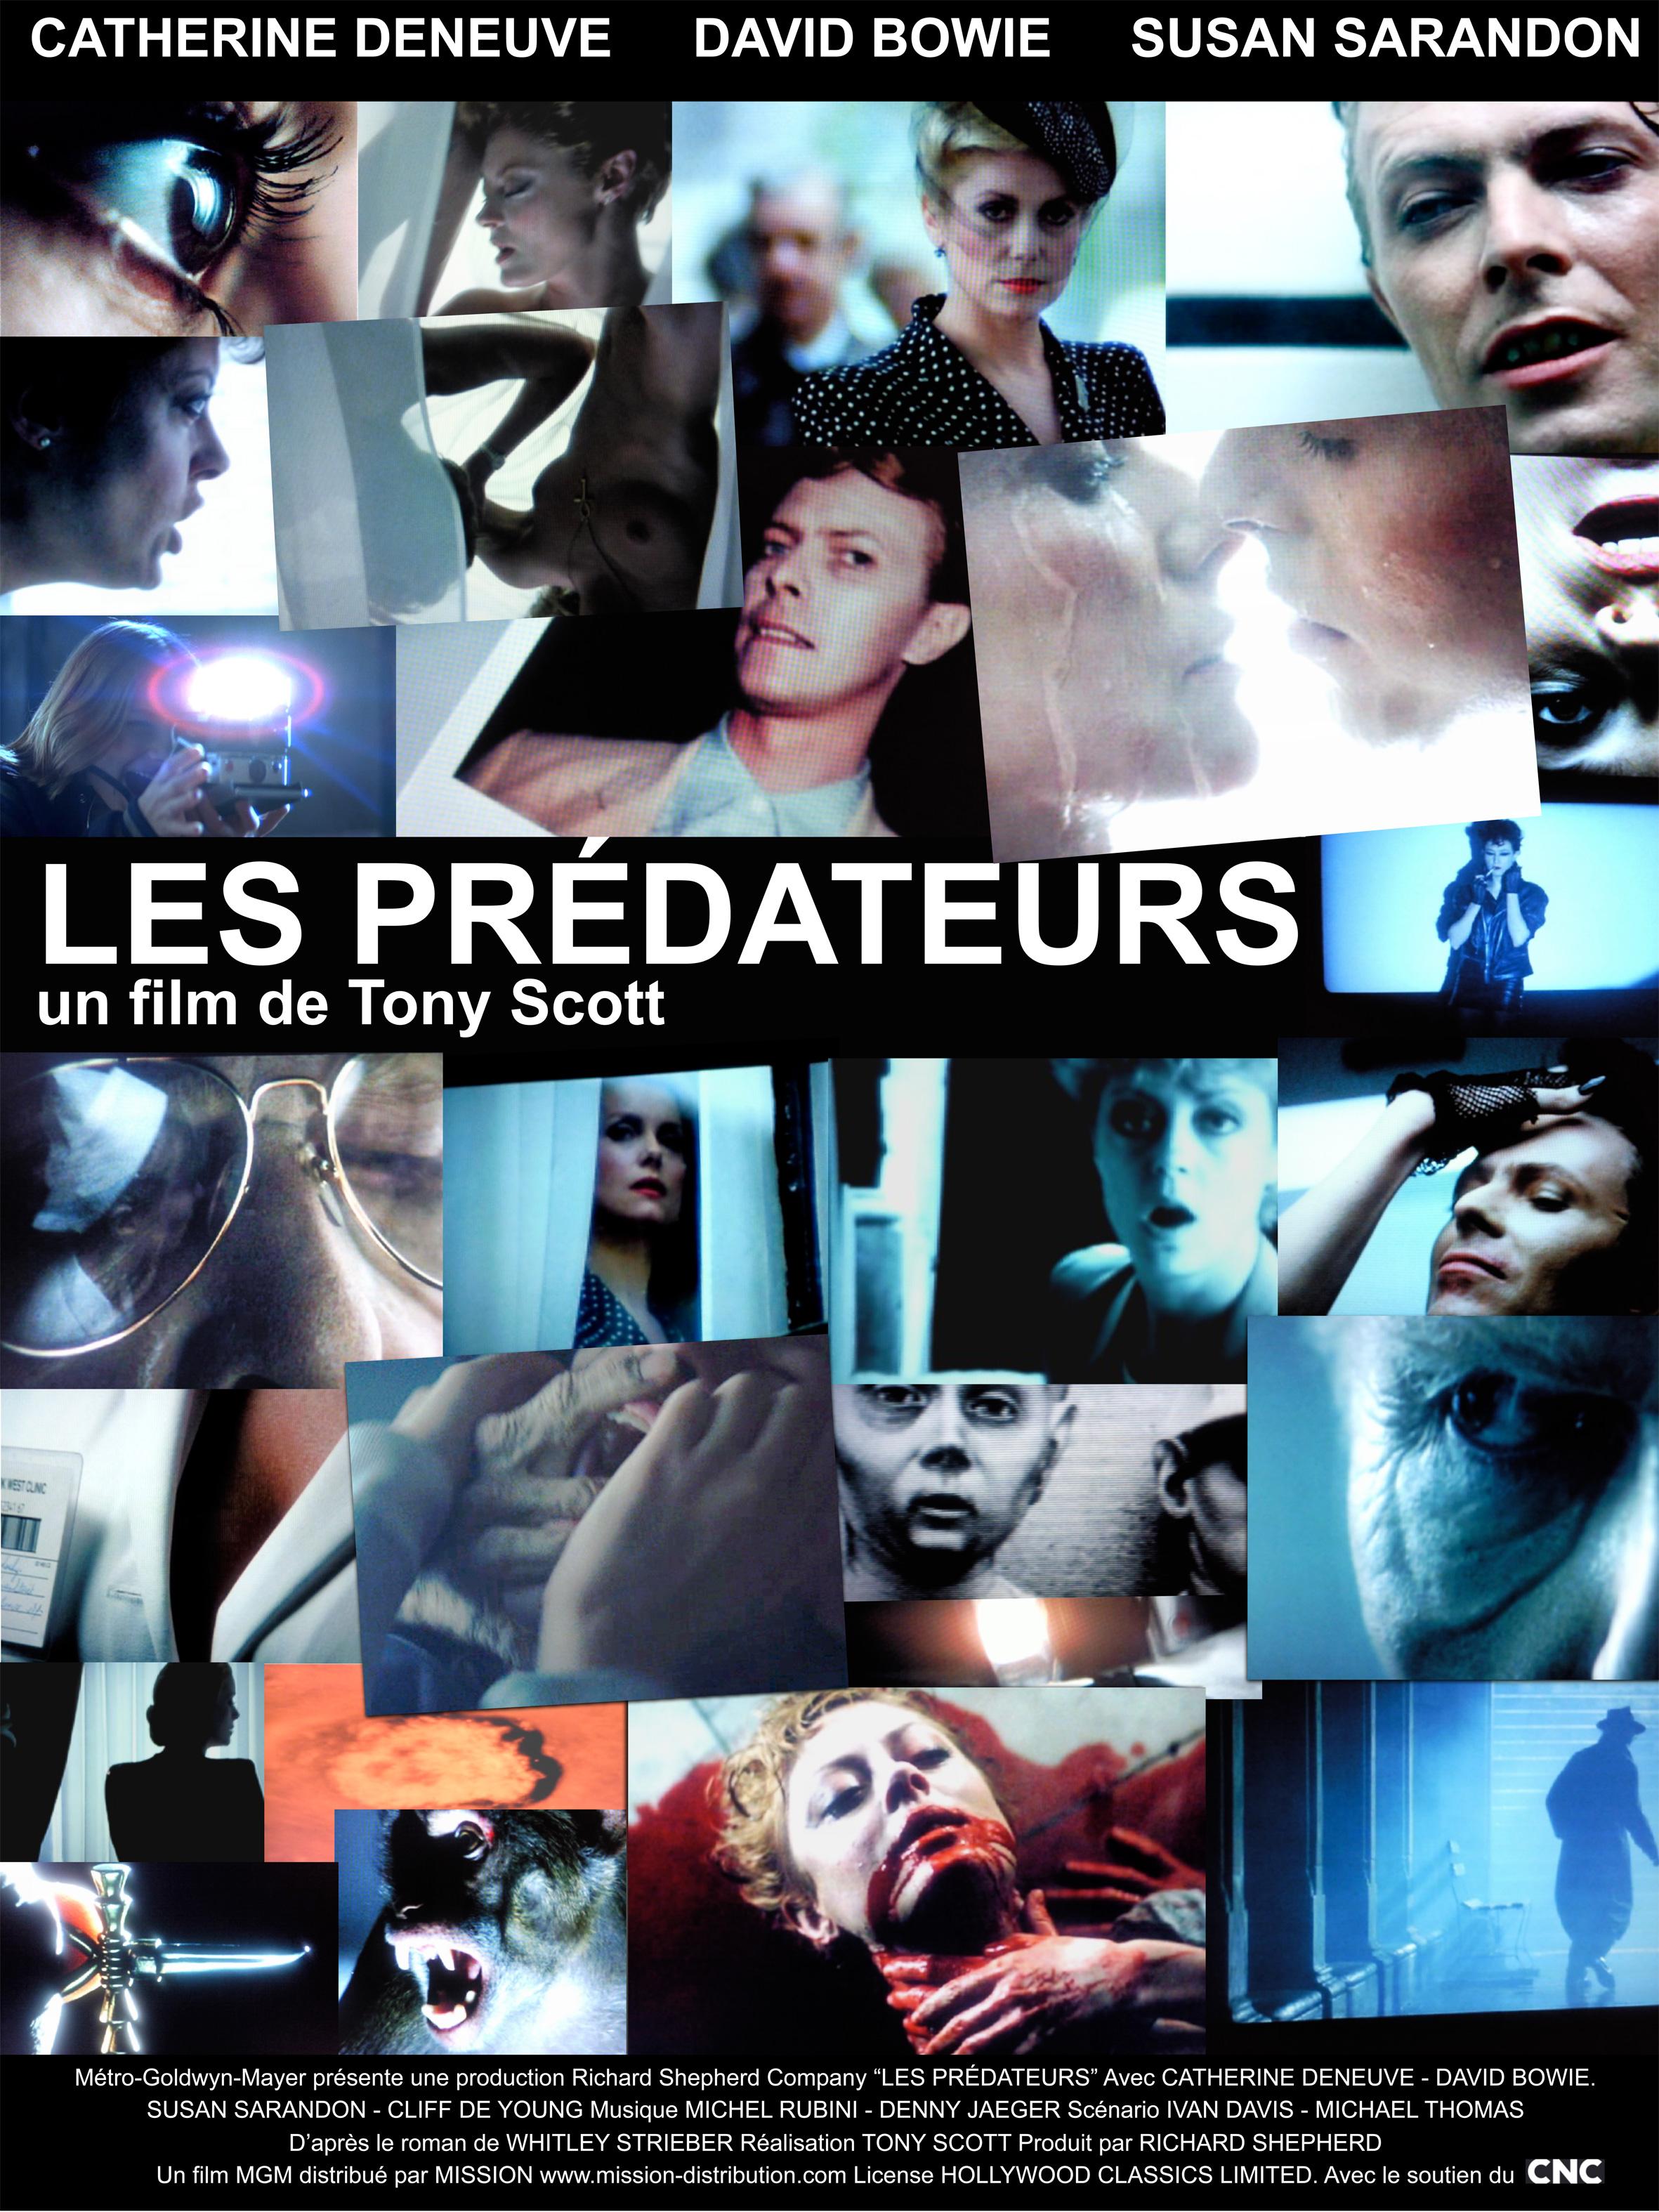 http://www.cinealliance.fr/festival/gerardmer09/i/predateurs.jpg